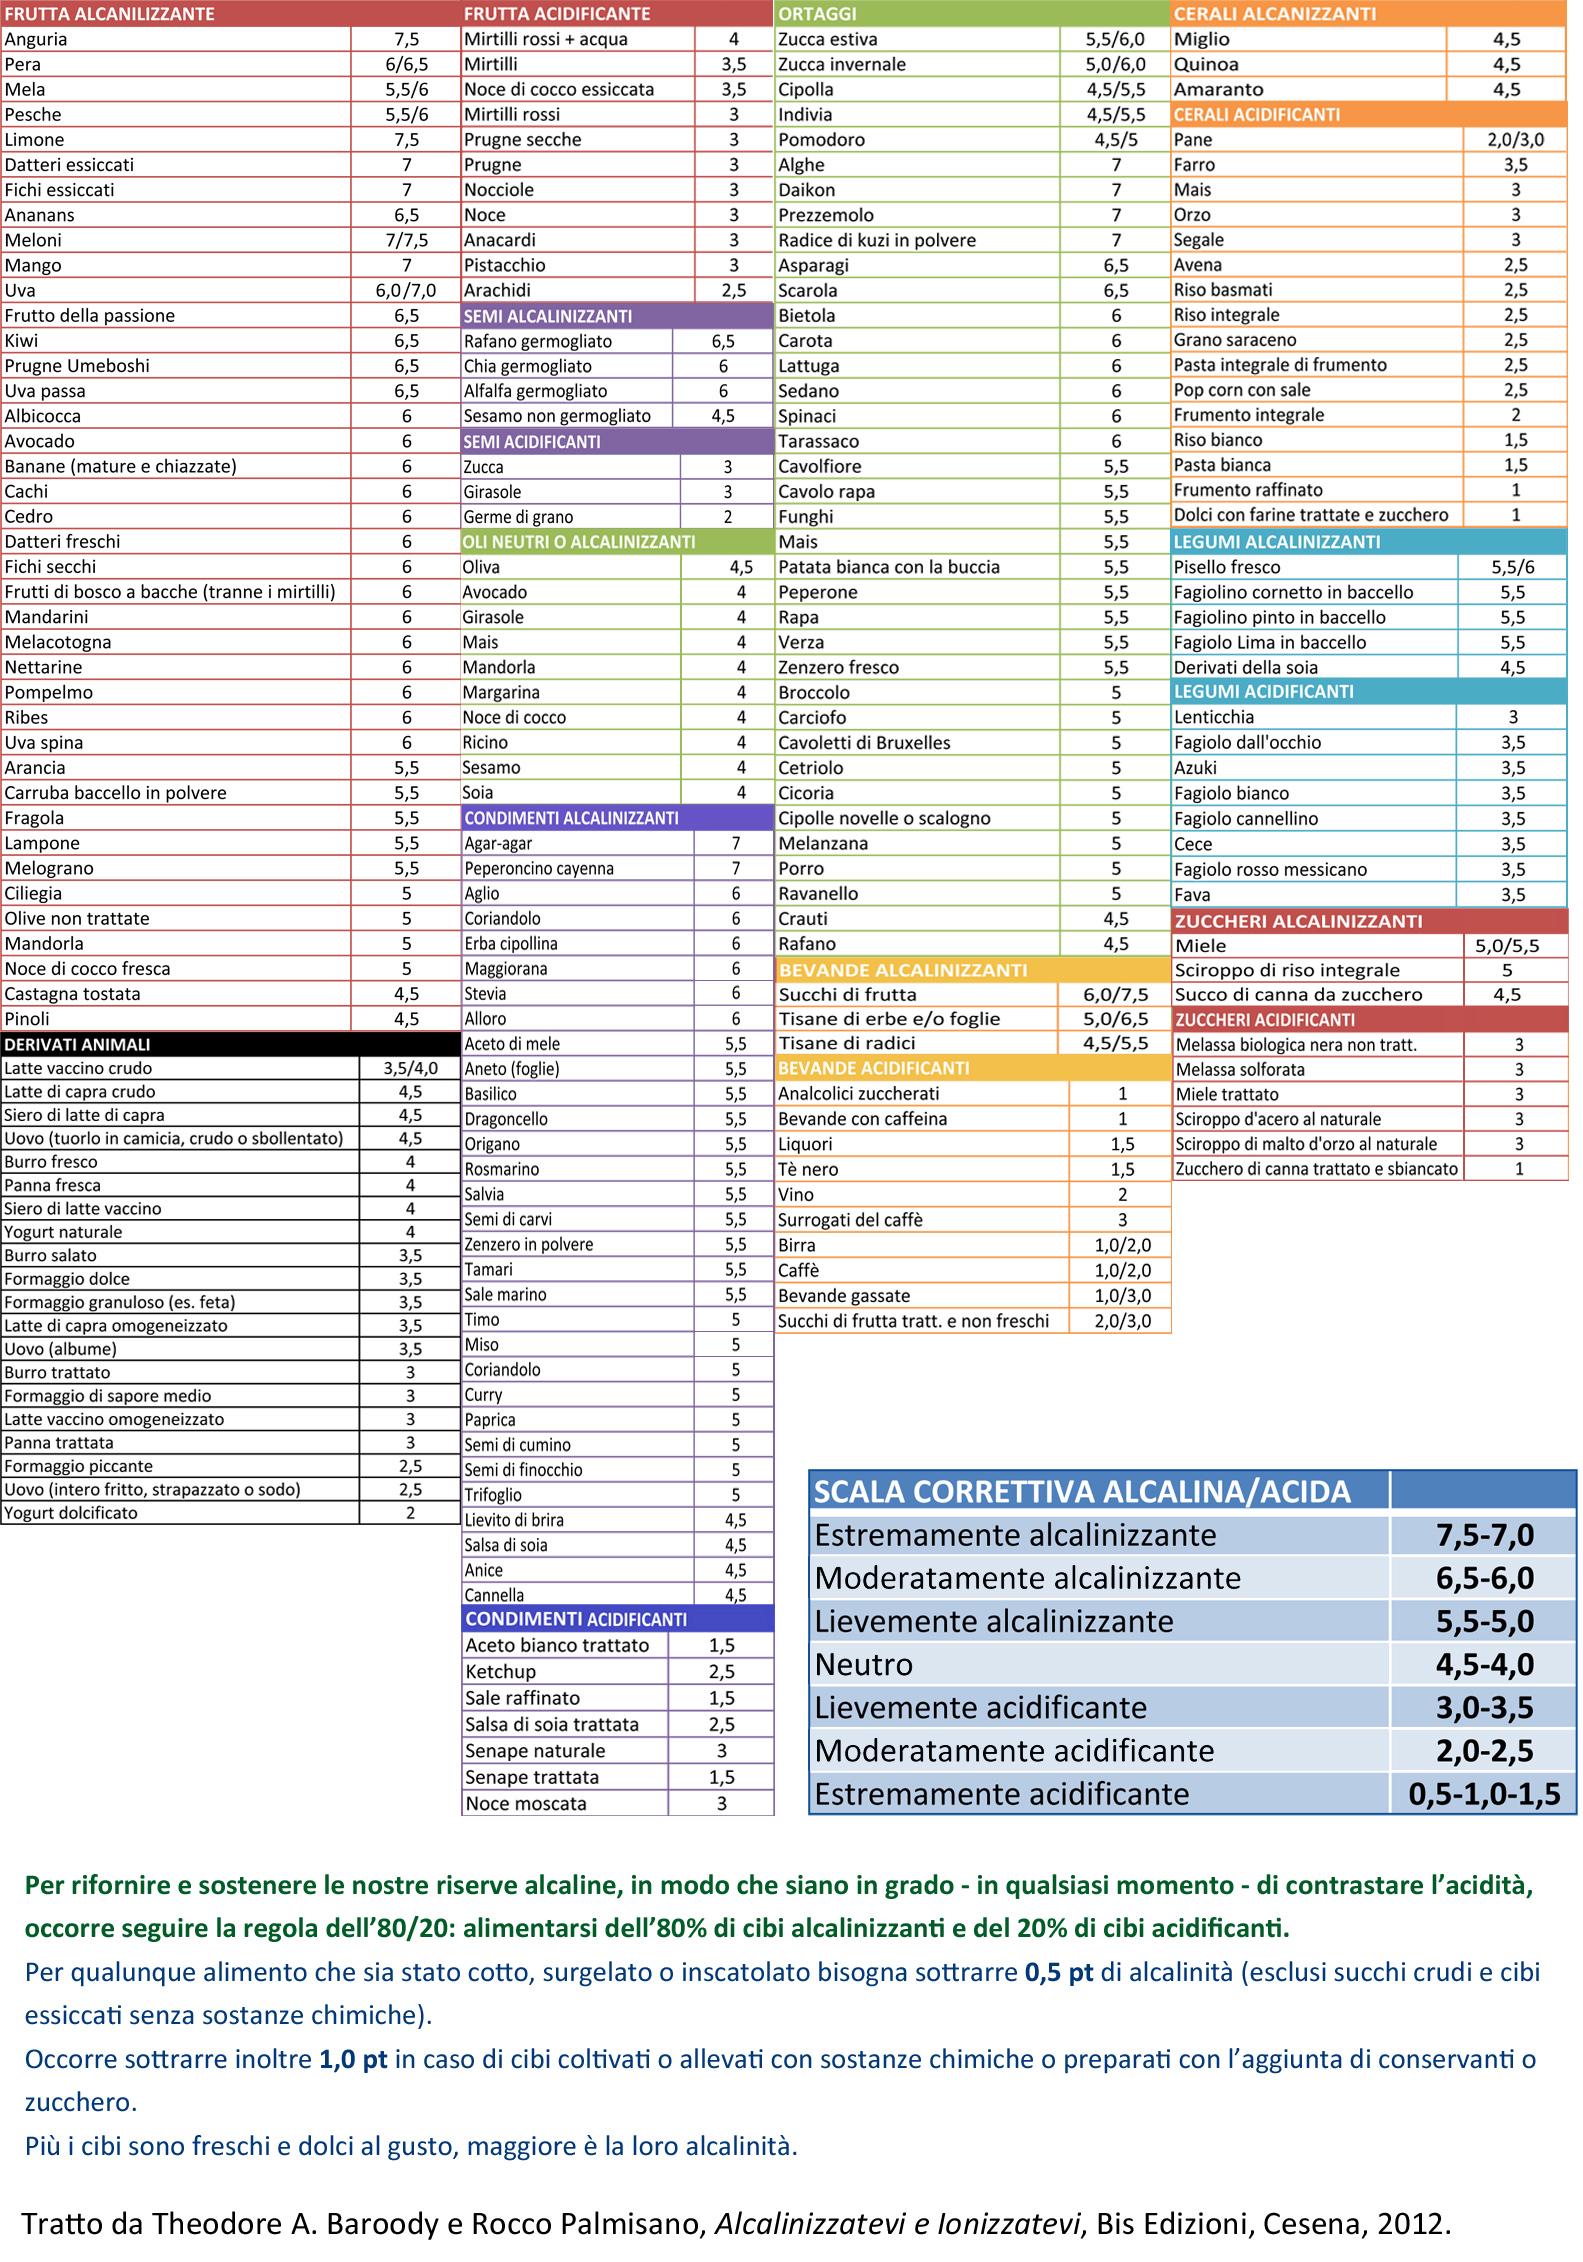 tabella_acido_basico_completa